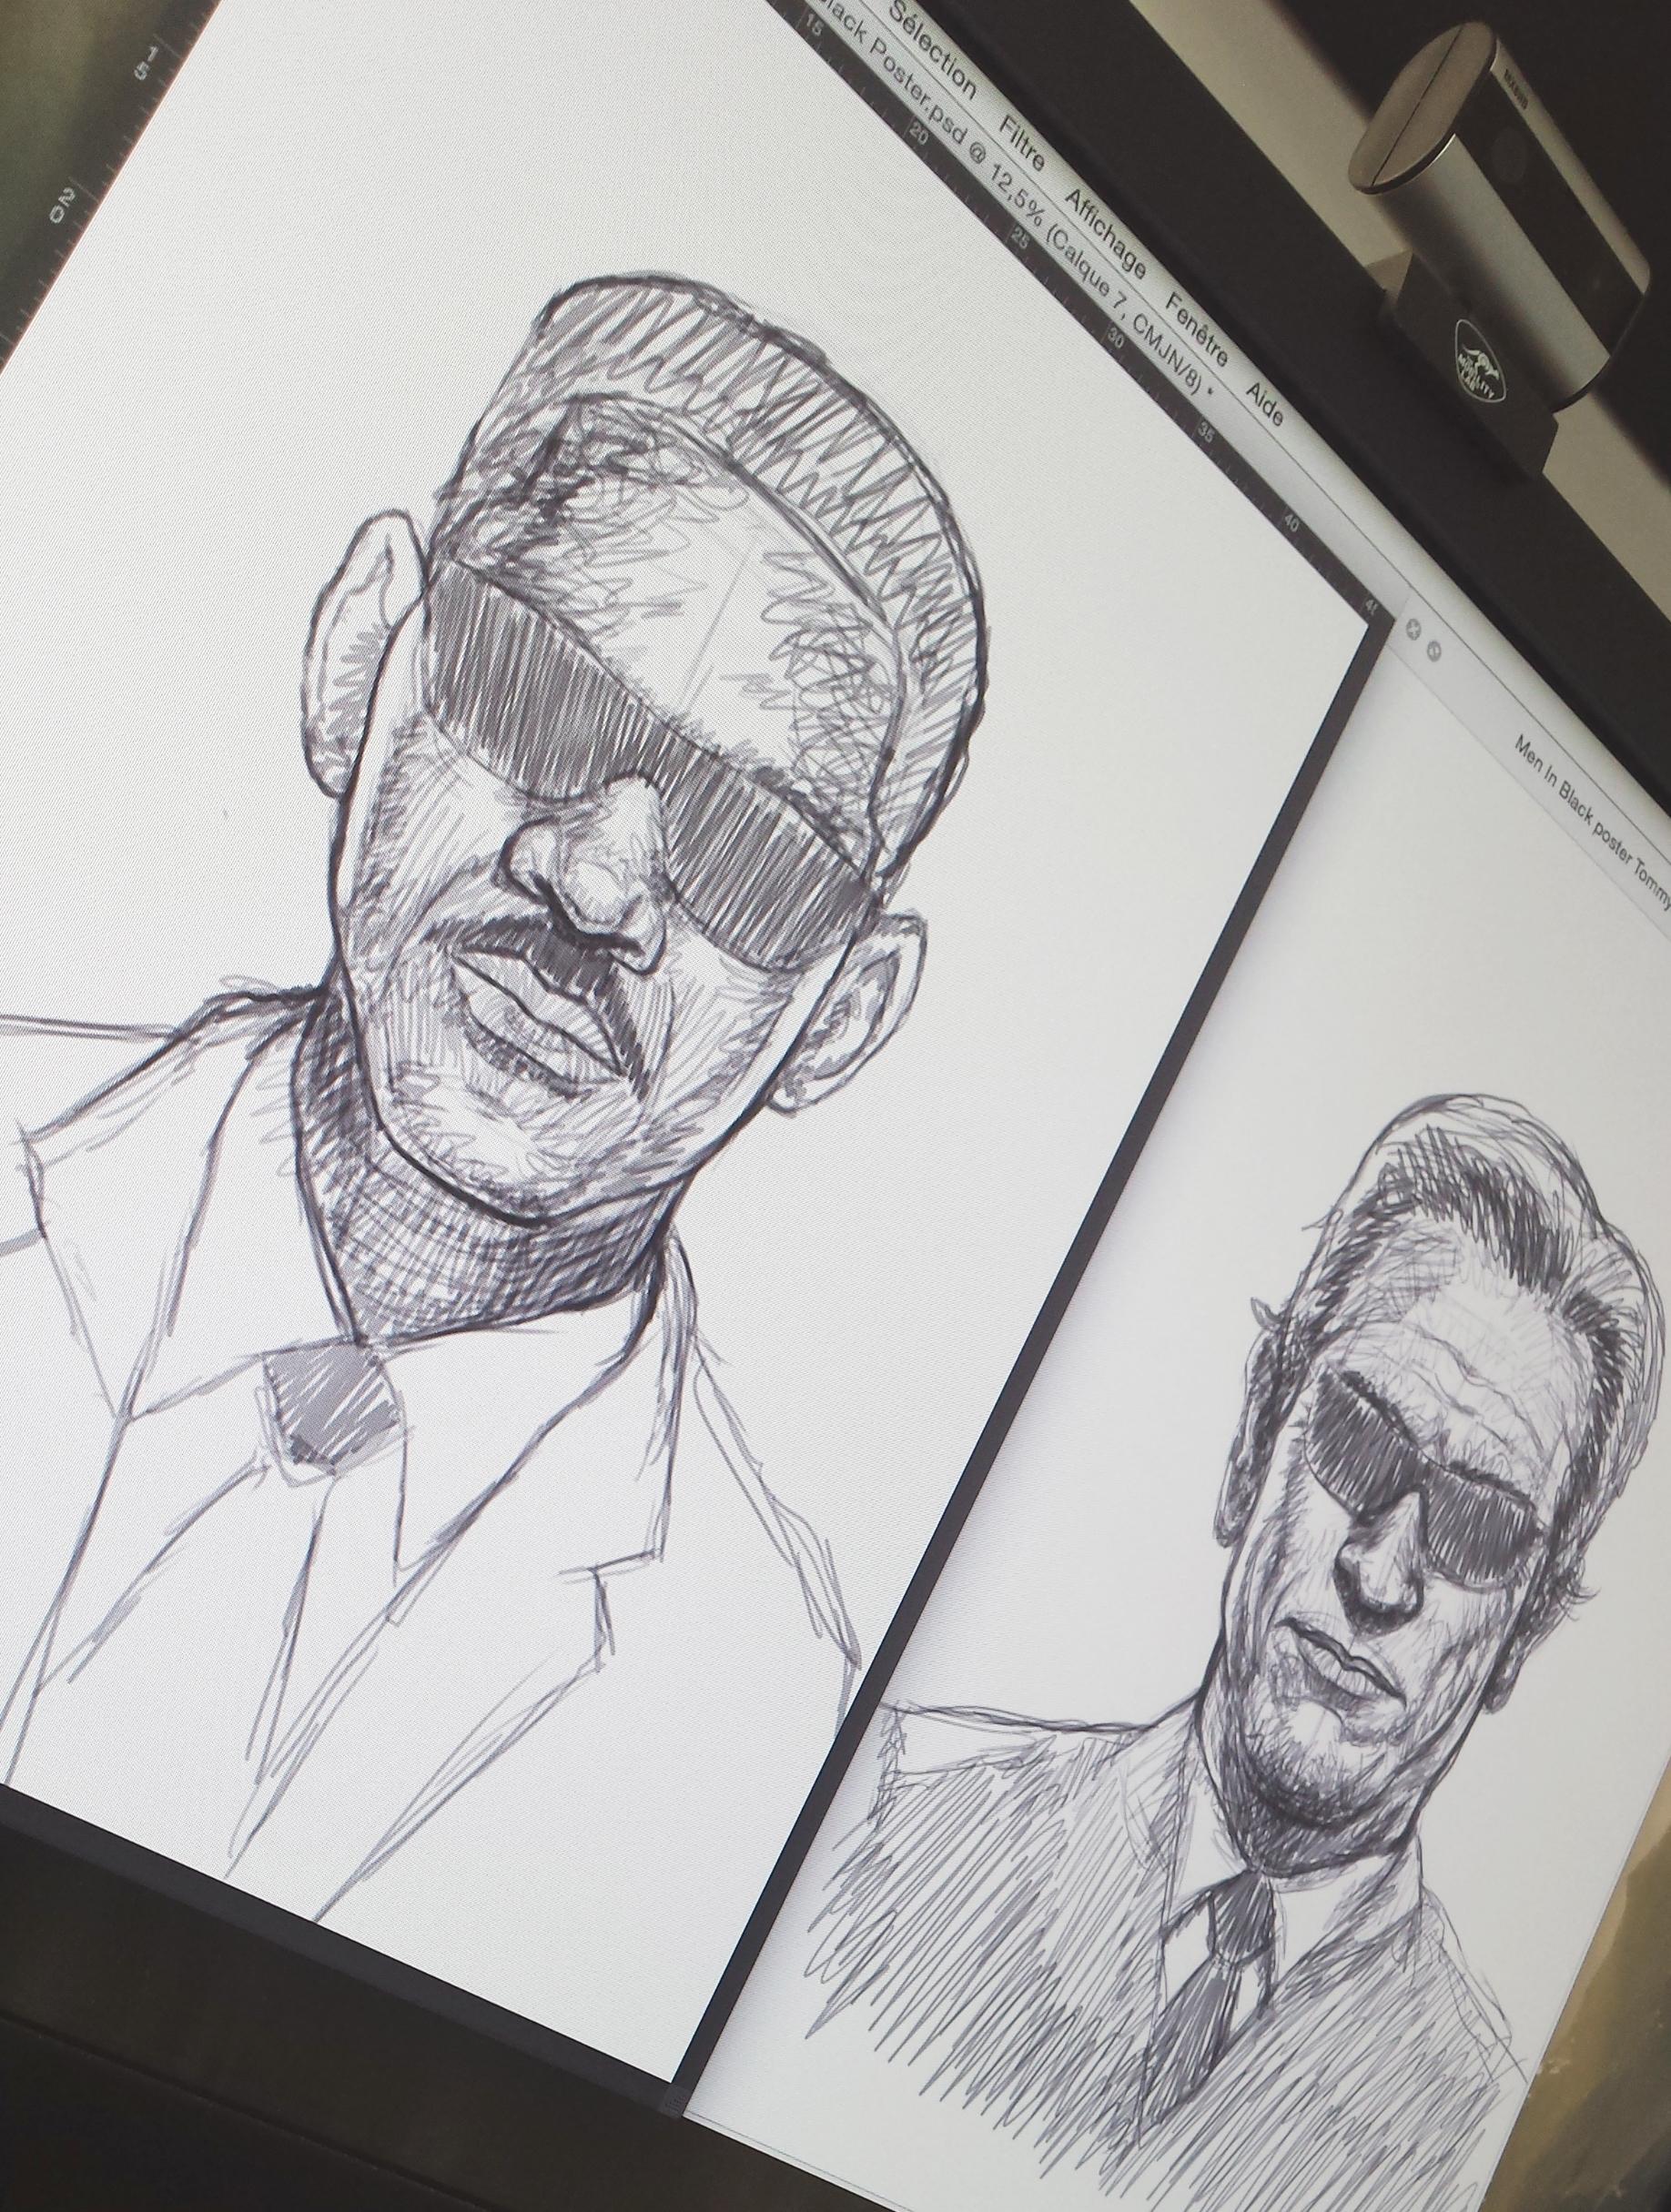 picture 2 drawings digitally Me - ladislas-2174 | ello